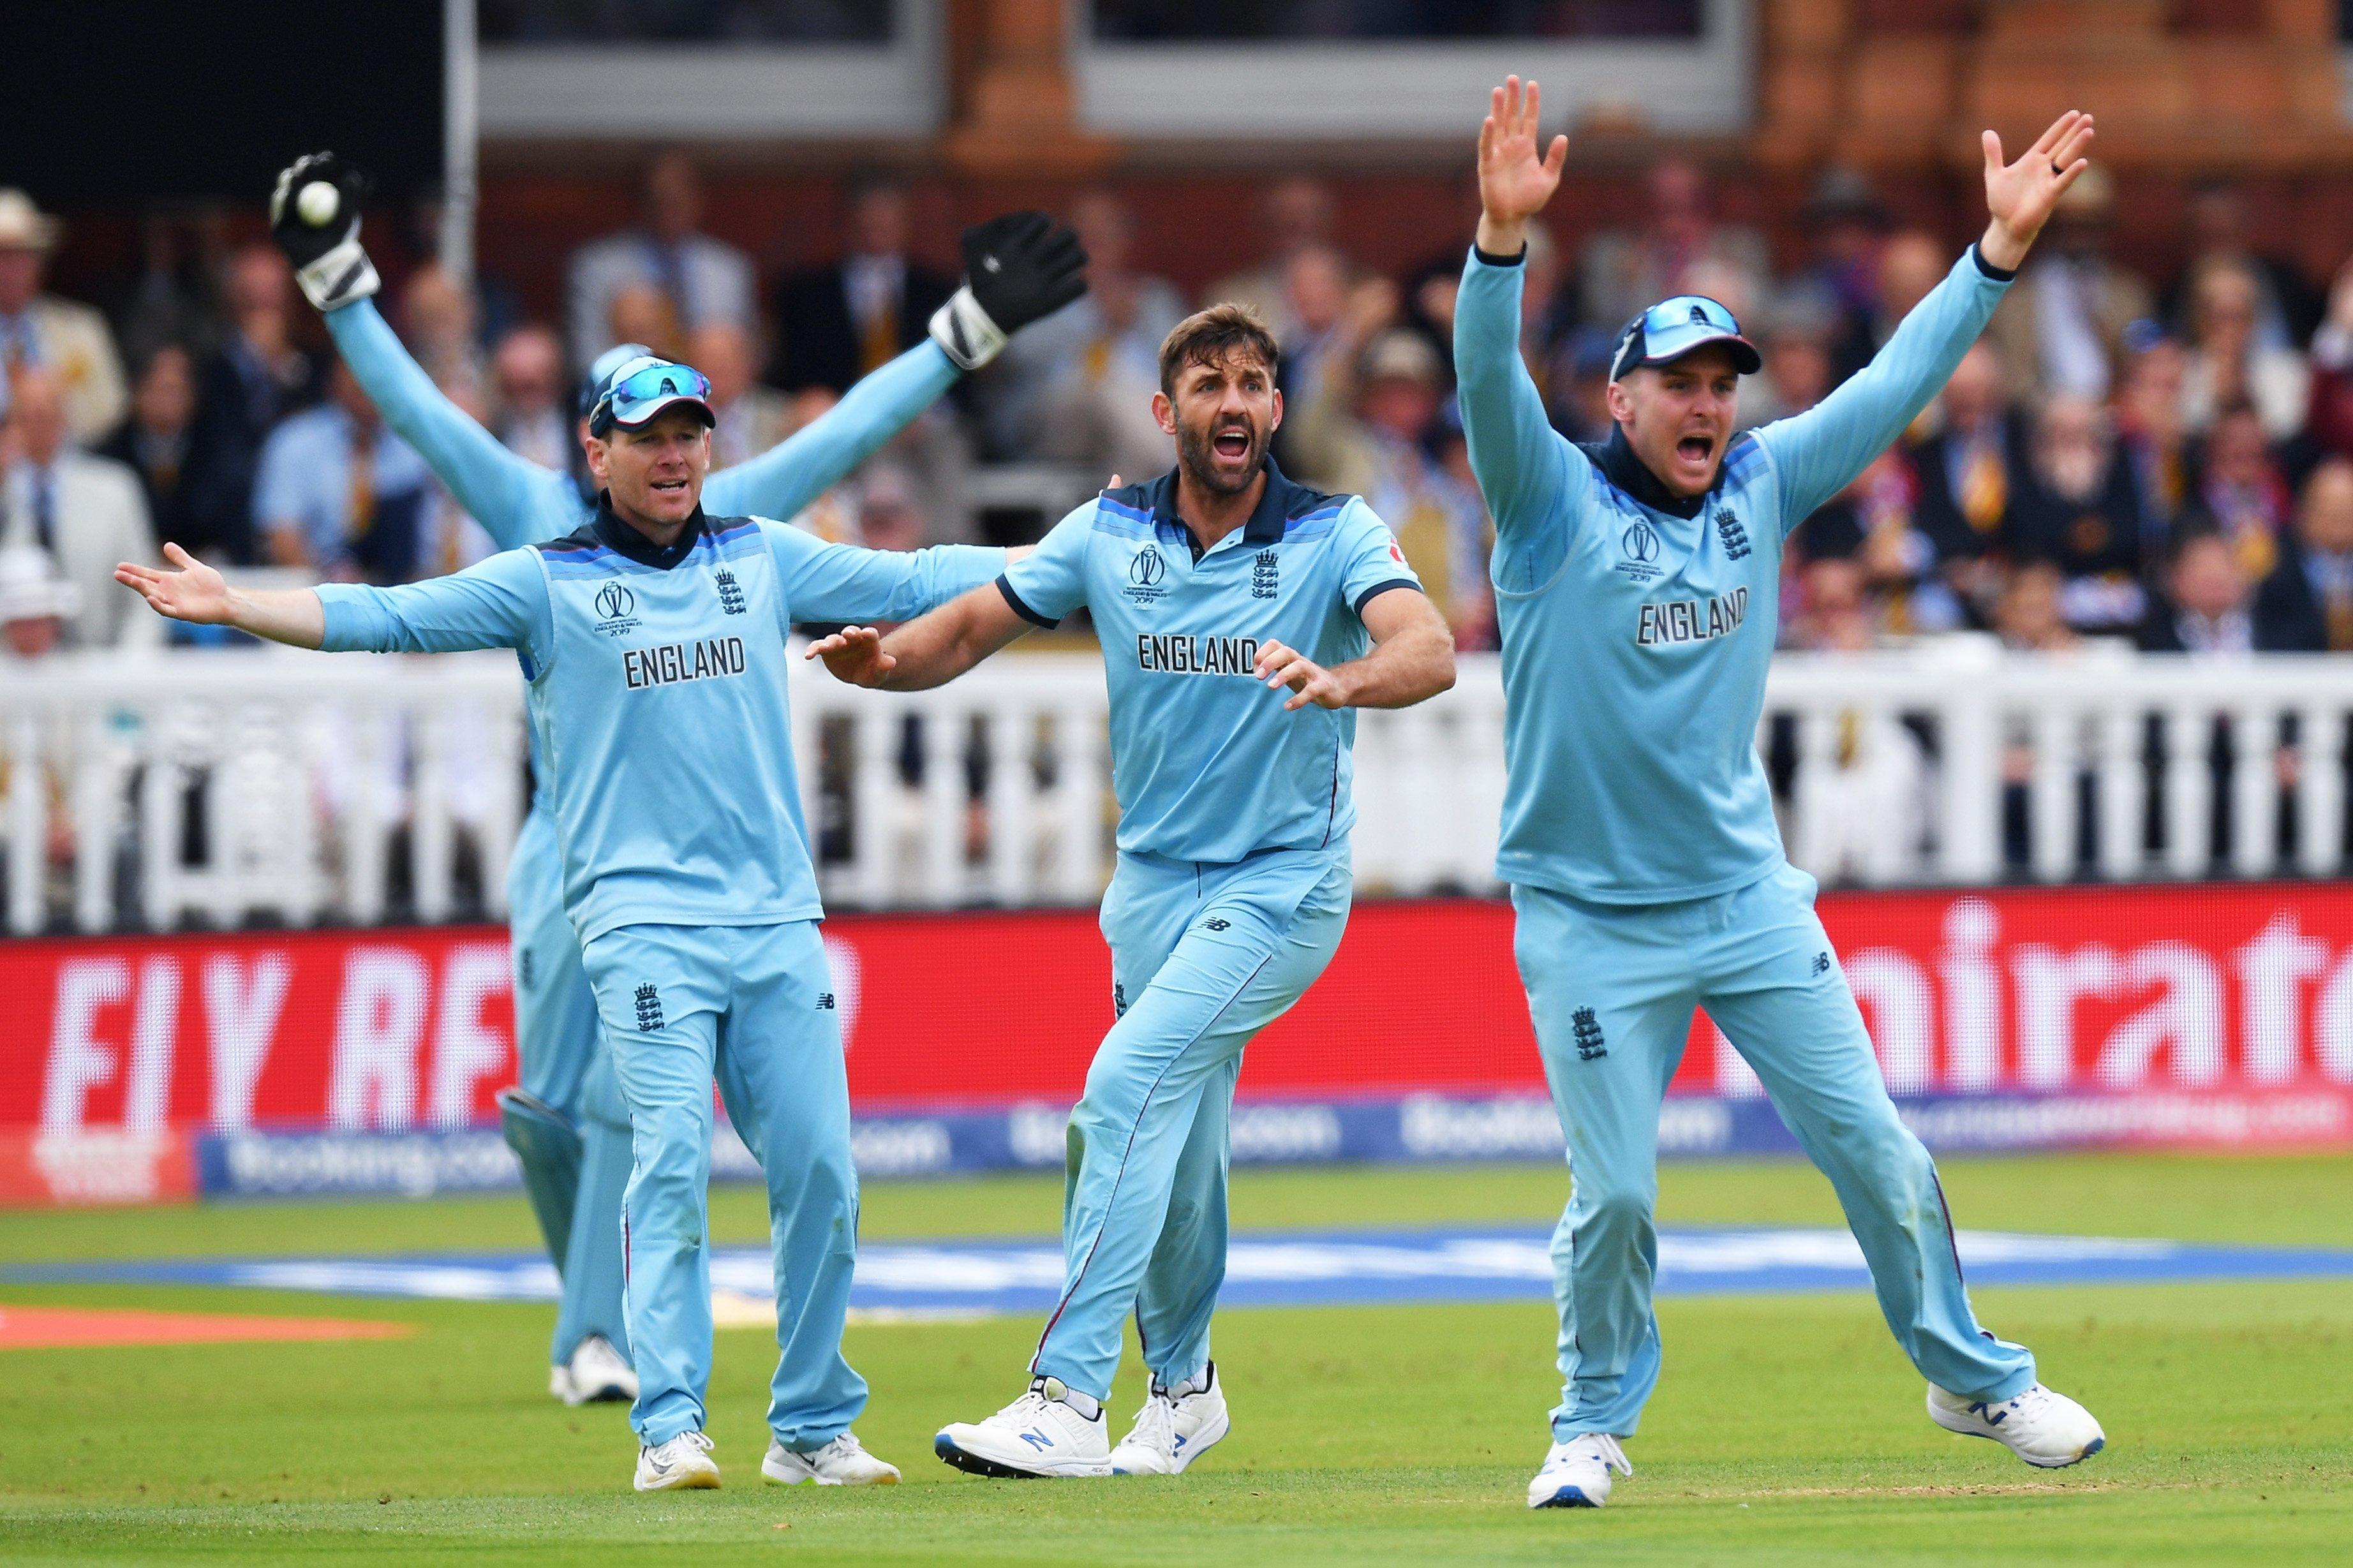 England defeats New Zealand in astonishing Cricket World Cup final